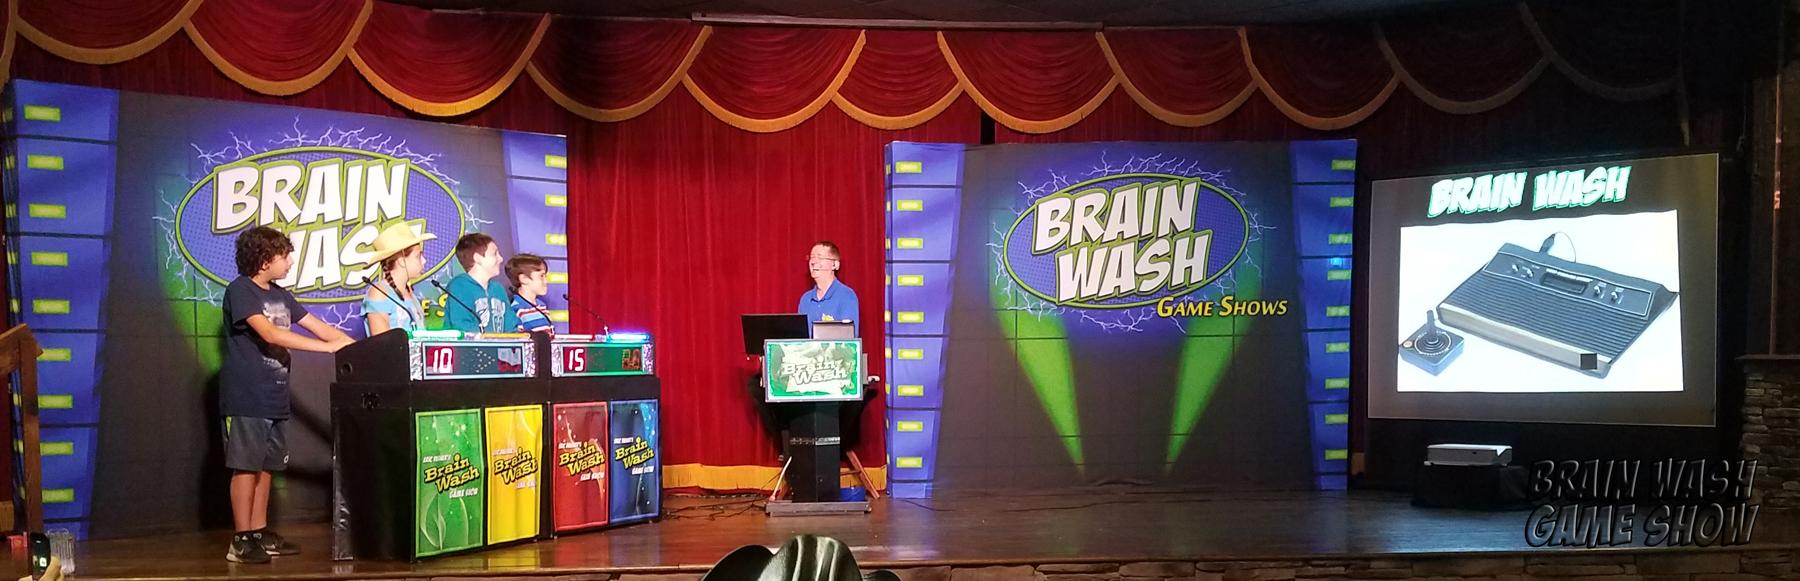 Brain Wash Game Show 3